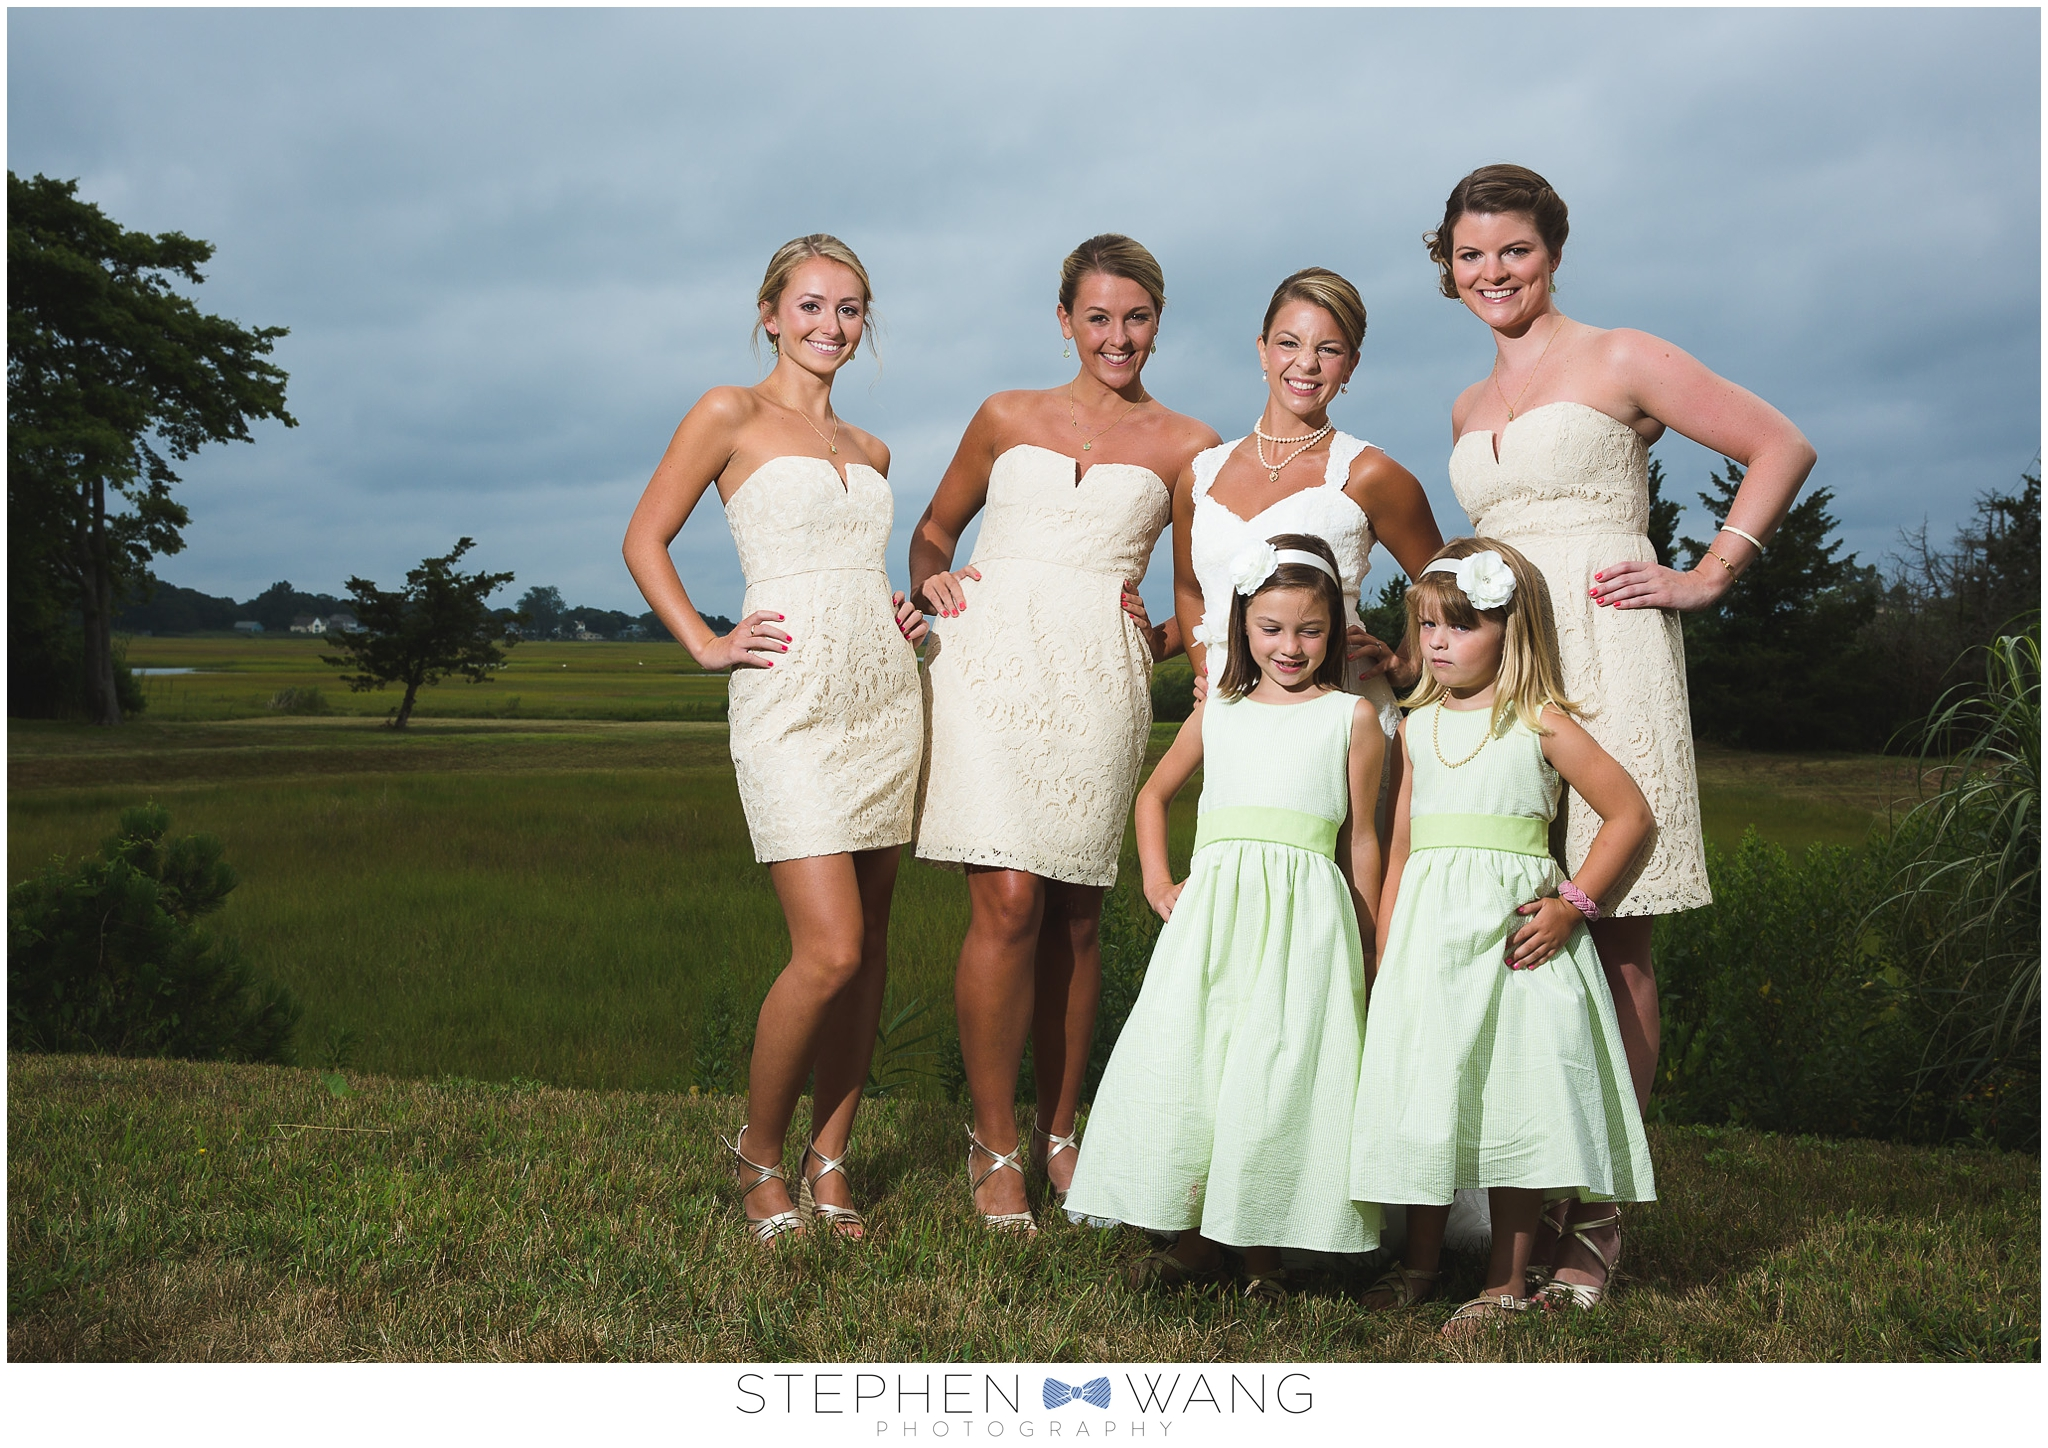 Stephen Wang Photography Madison Surf Club Wedding Photogrpahy CT Connecticut Shoreline Beach Summer Sunset -08-12_0006.jpg